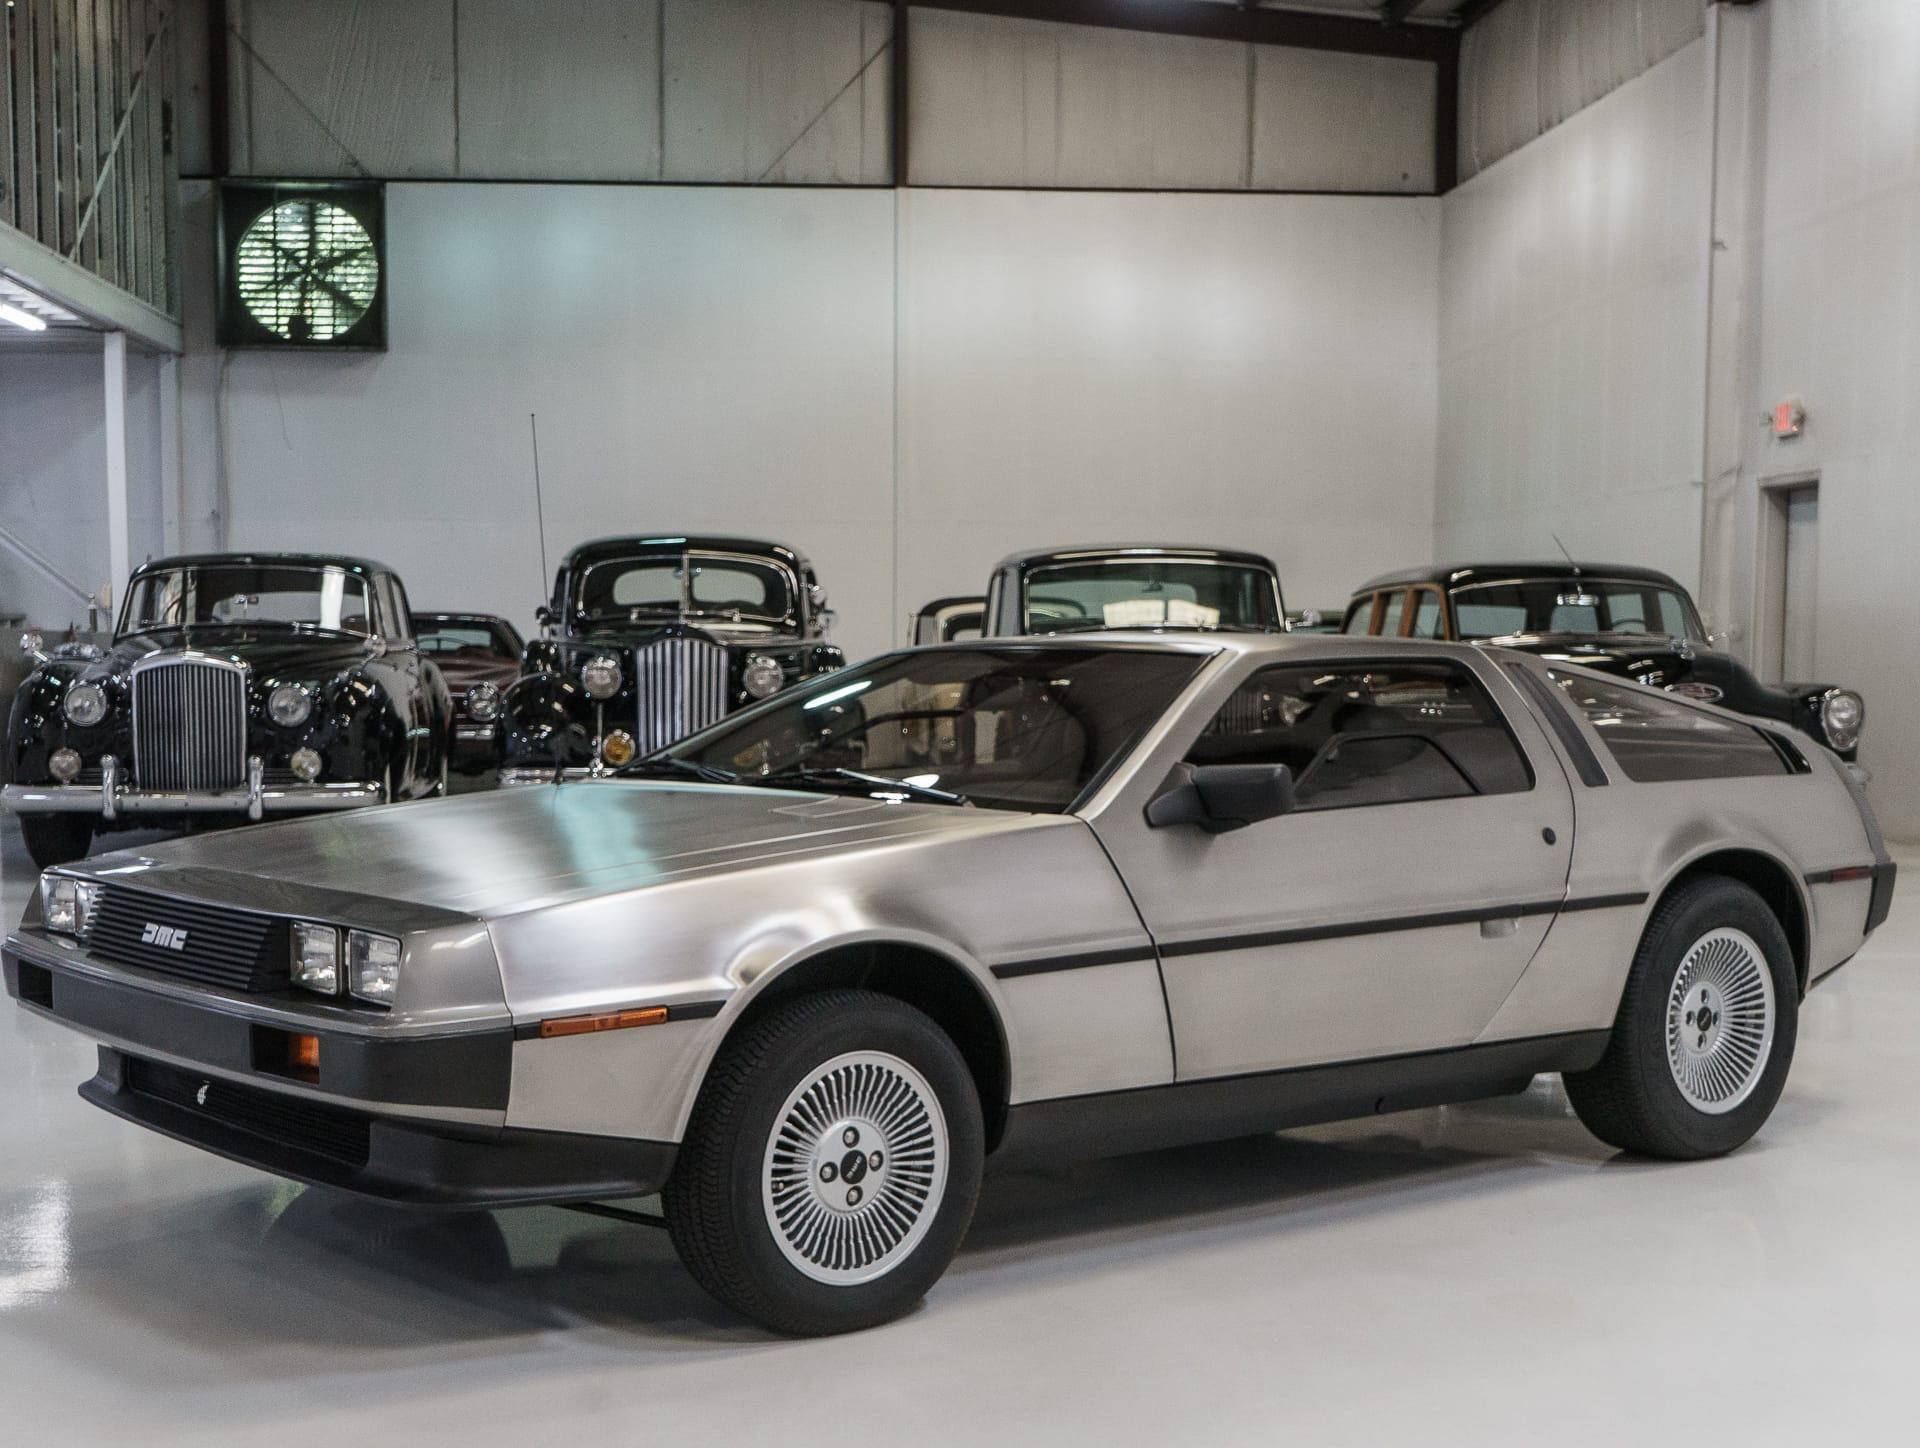 1981 DeLorean DMC-12 for sale Daniel Schmitt & Co.